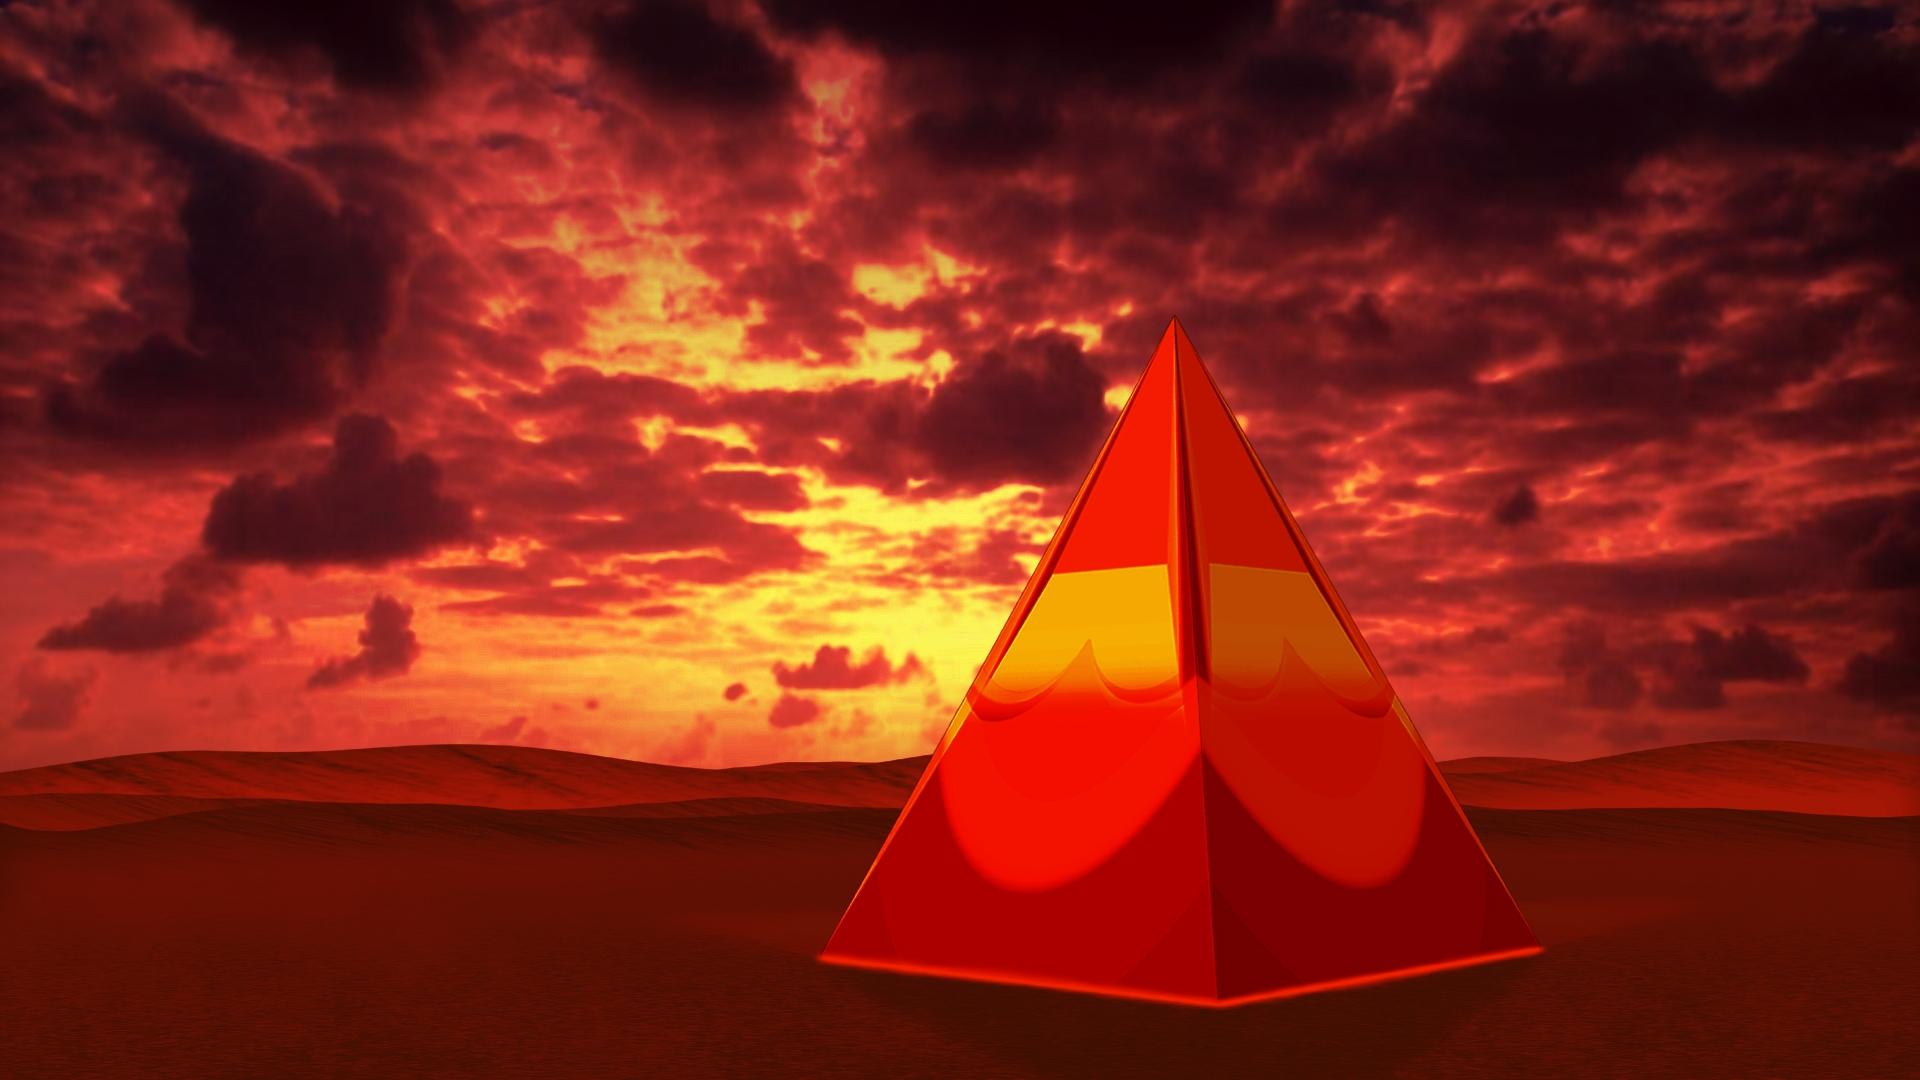 пирамида, красная, фон